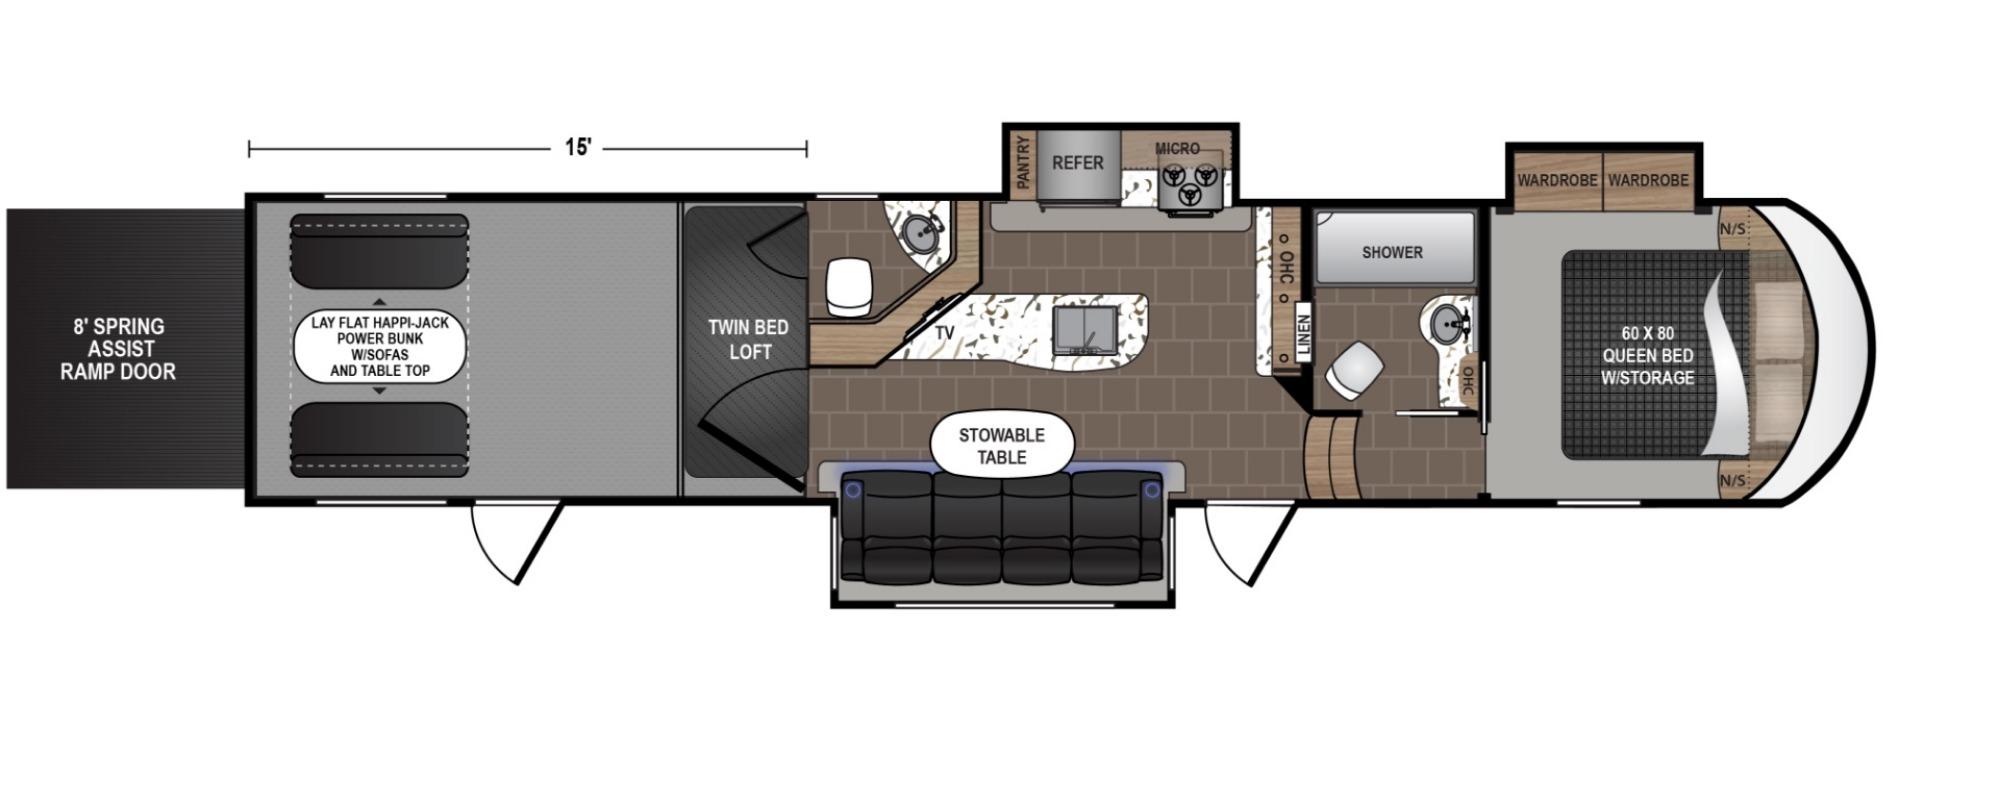 Exterior : 2019-DUTCHMEN-3956G